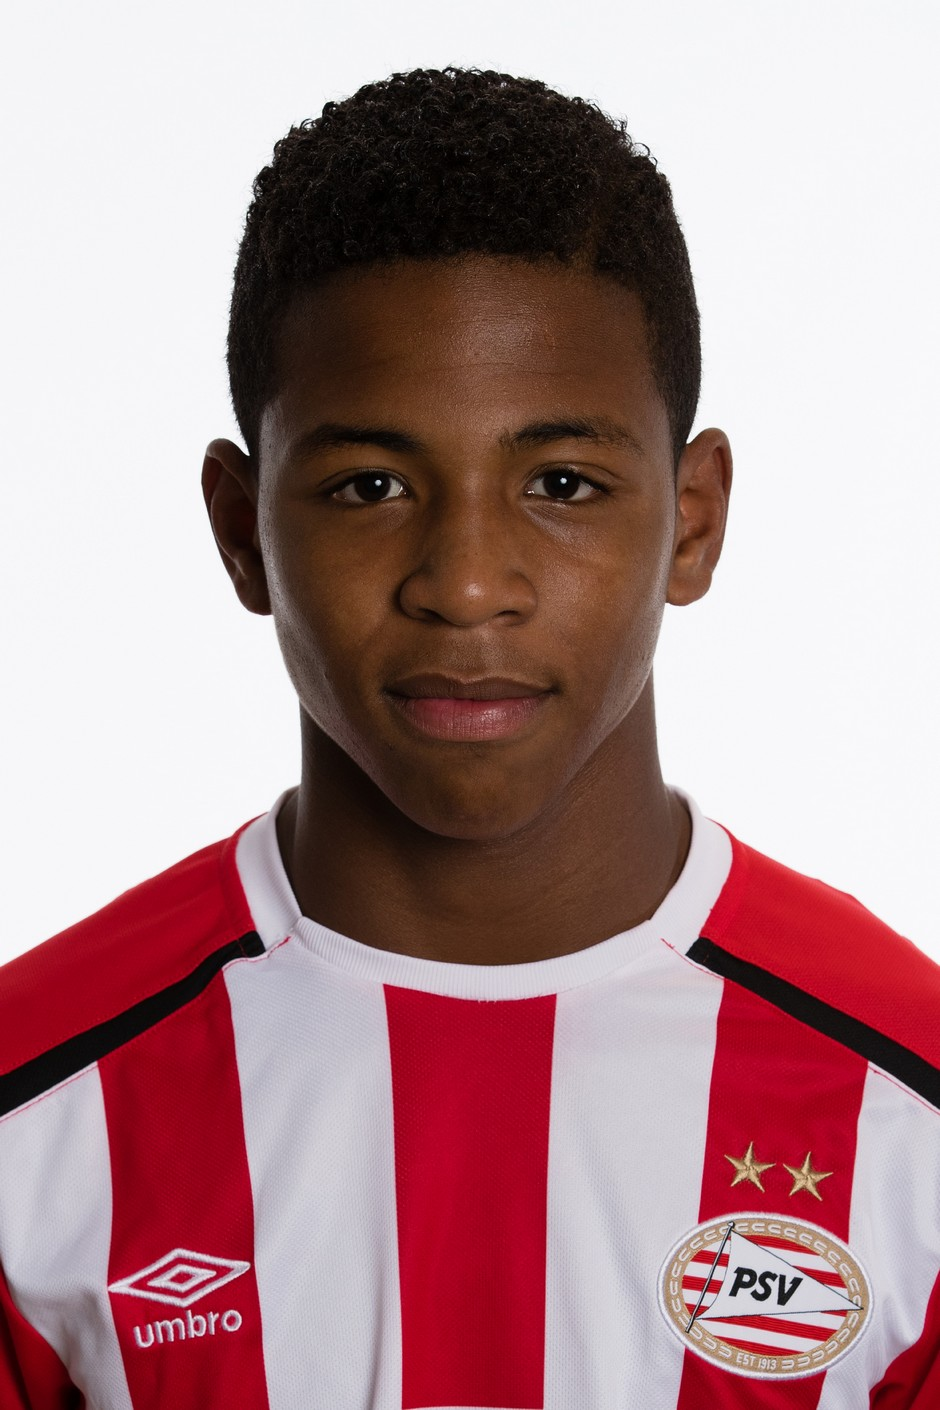 PSV O16 - 2016-2017